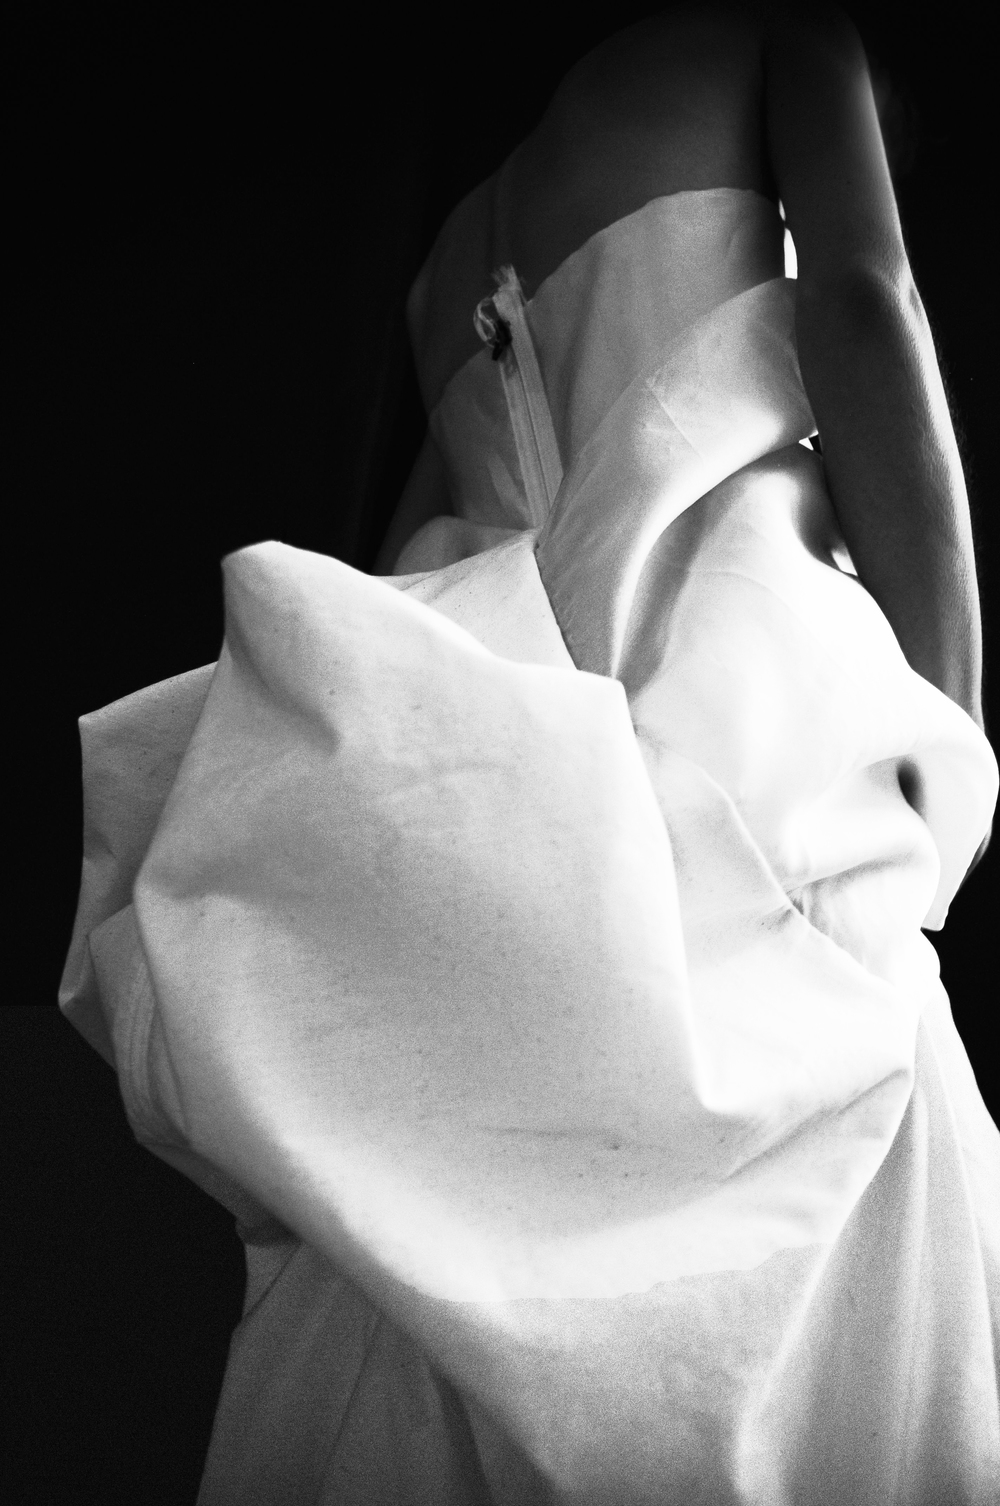 white dichotomy | katharine grace x krishna godhead haute couture spring/summer 2015 photography by floriana castagna| S/TUDIO